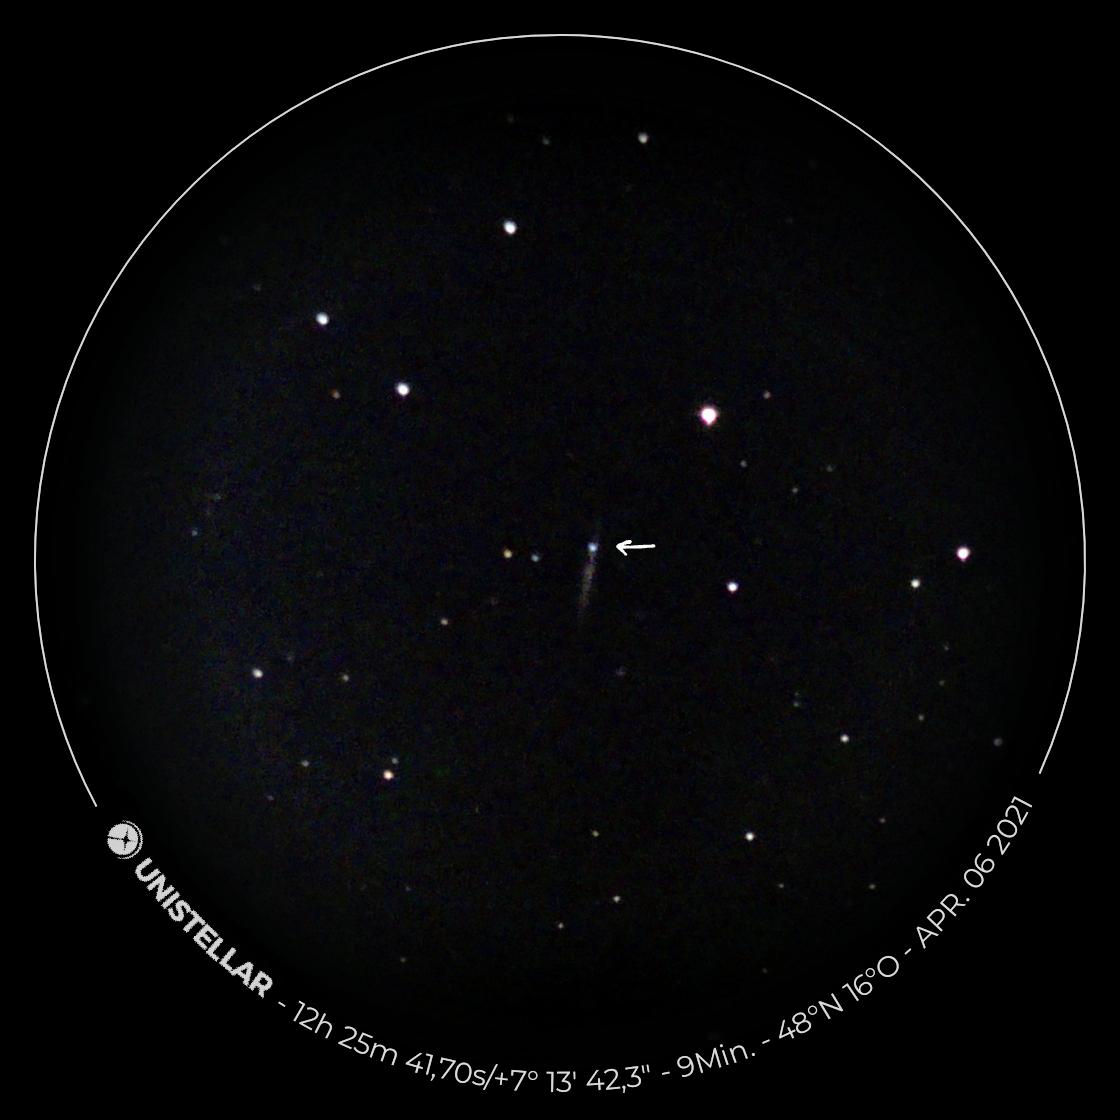 Supernova SN 2021hiz